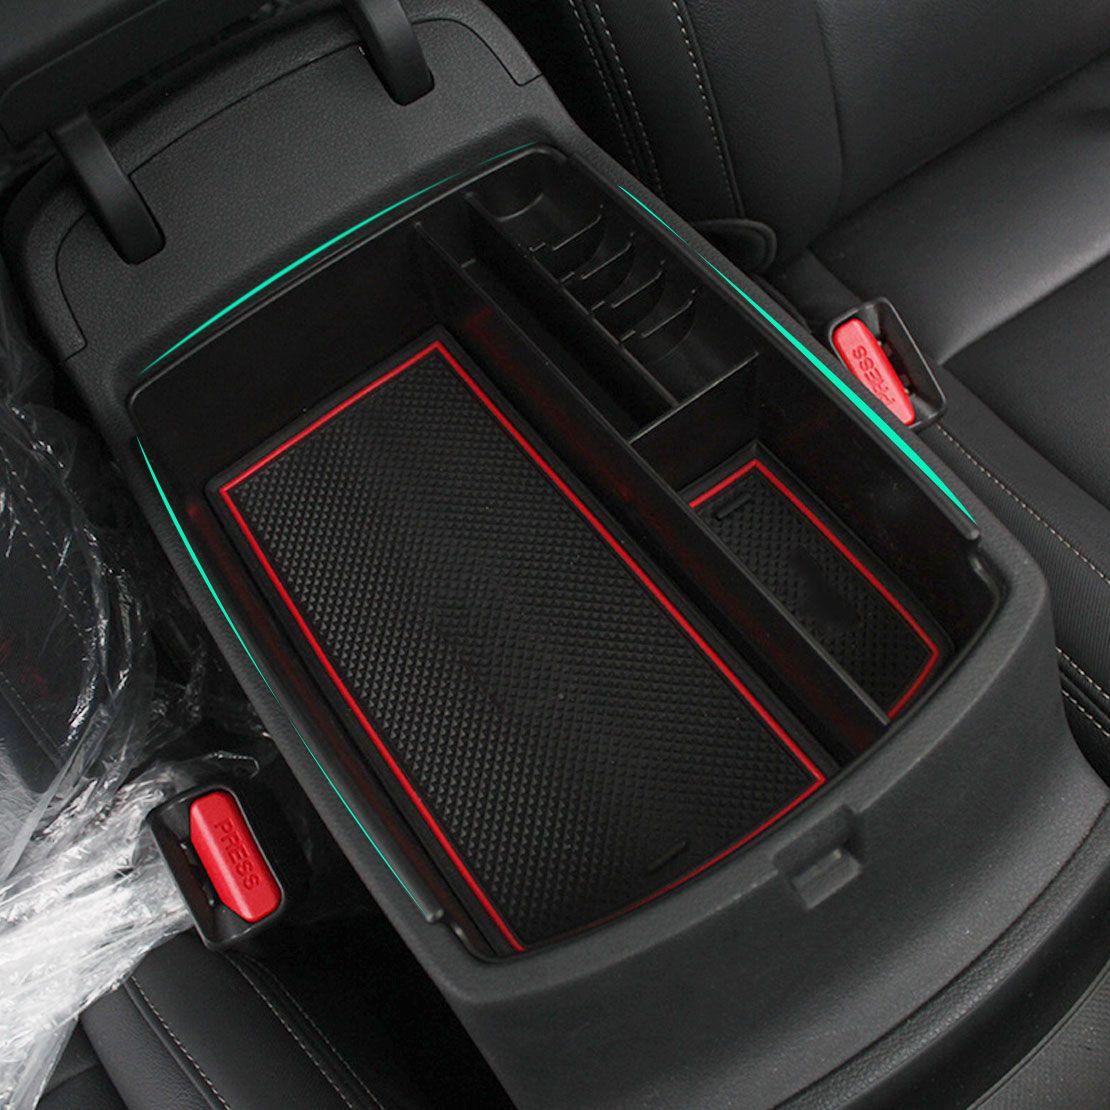 2014 Kia Sportage Interior: ABS Plastic Central Armrest Secondary Storage Glove Box